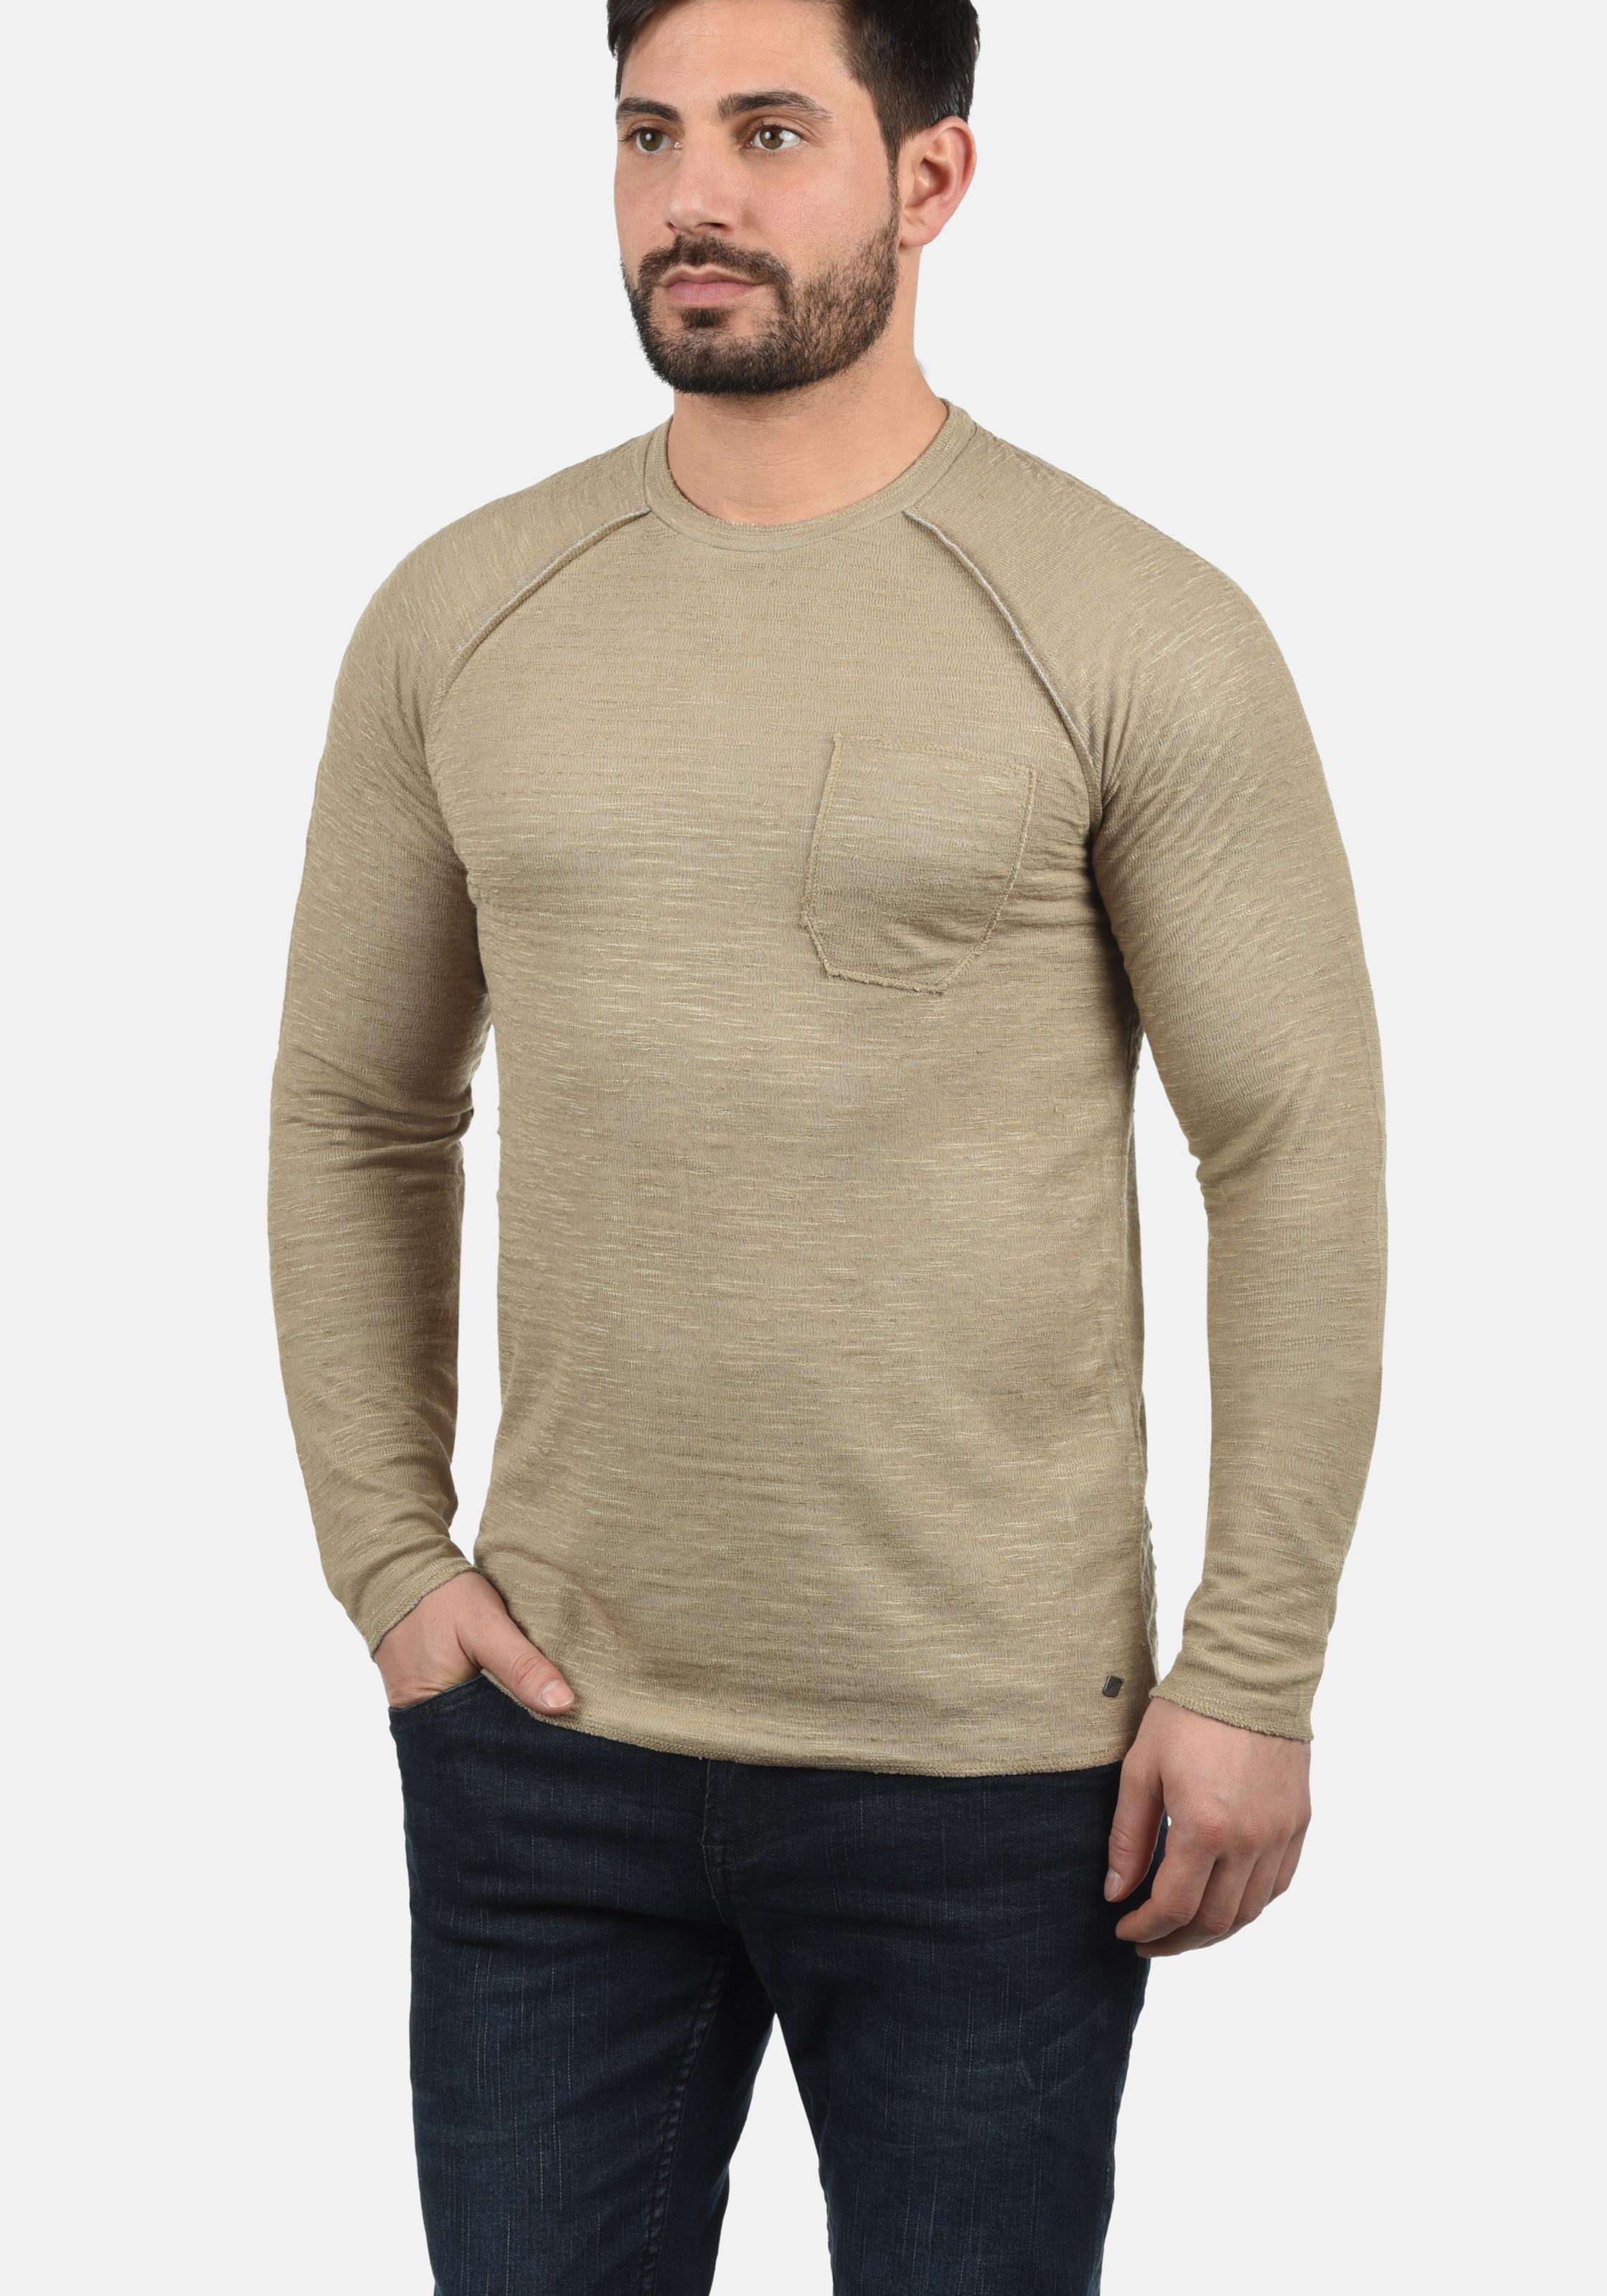 solid 'don' Sweatshirt 'don' In Sweatshirt In Beige solid R3jL5Aq4